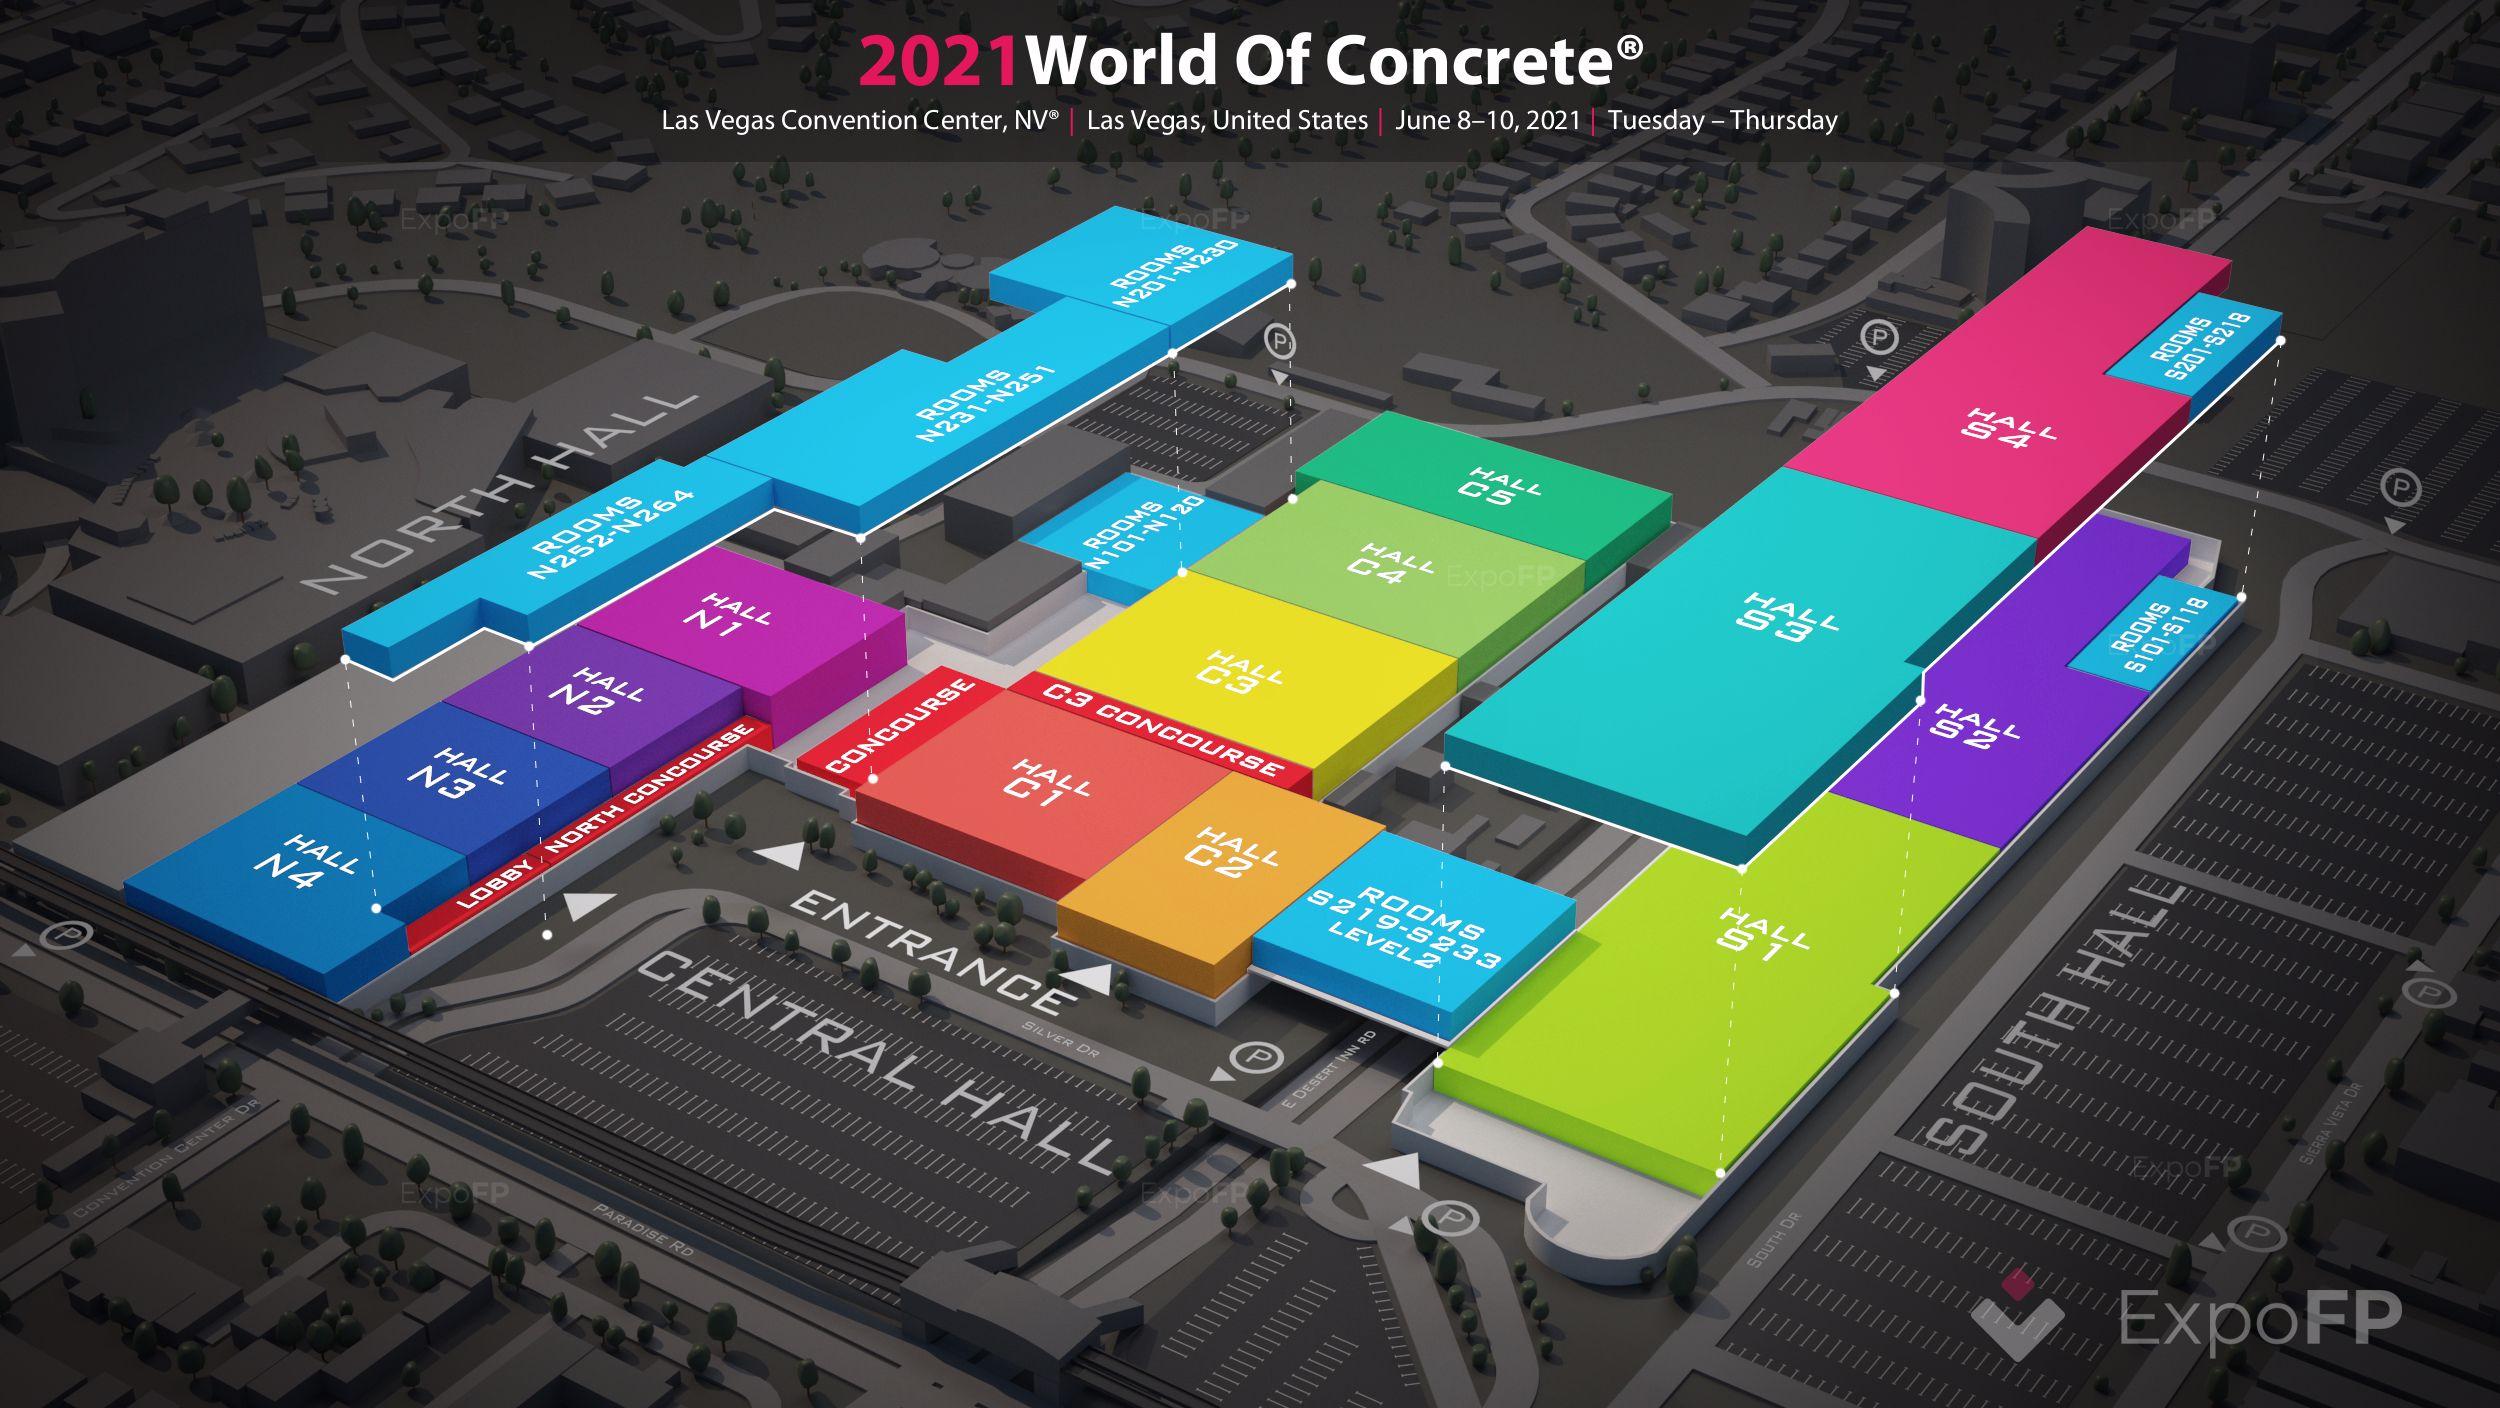 World of concrete 2021 las vegas | las vegas convention center floorplan | world of concrete 2021